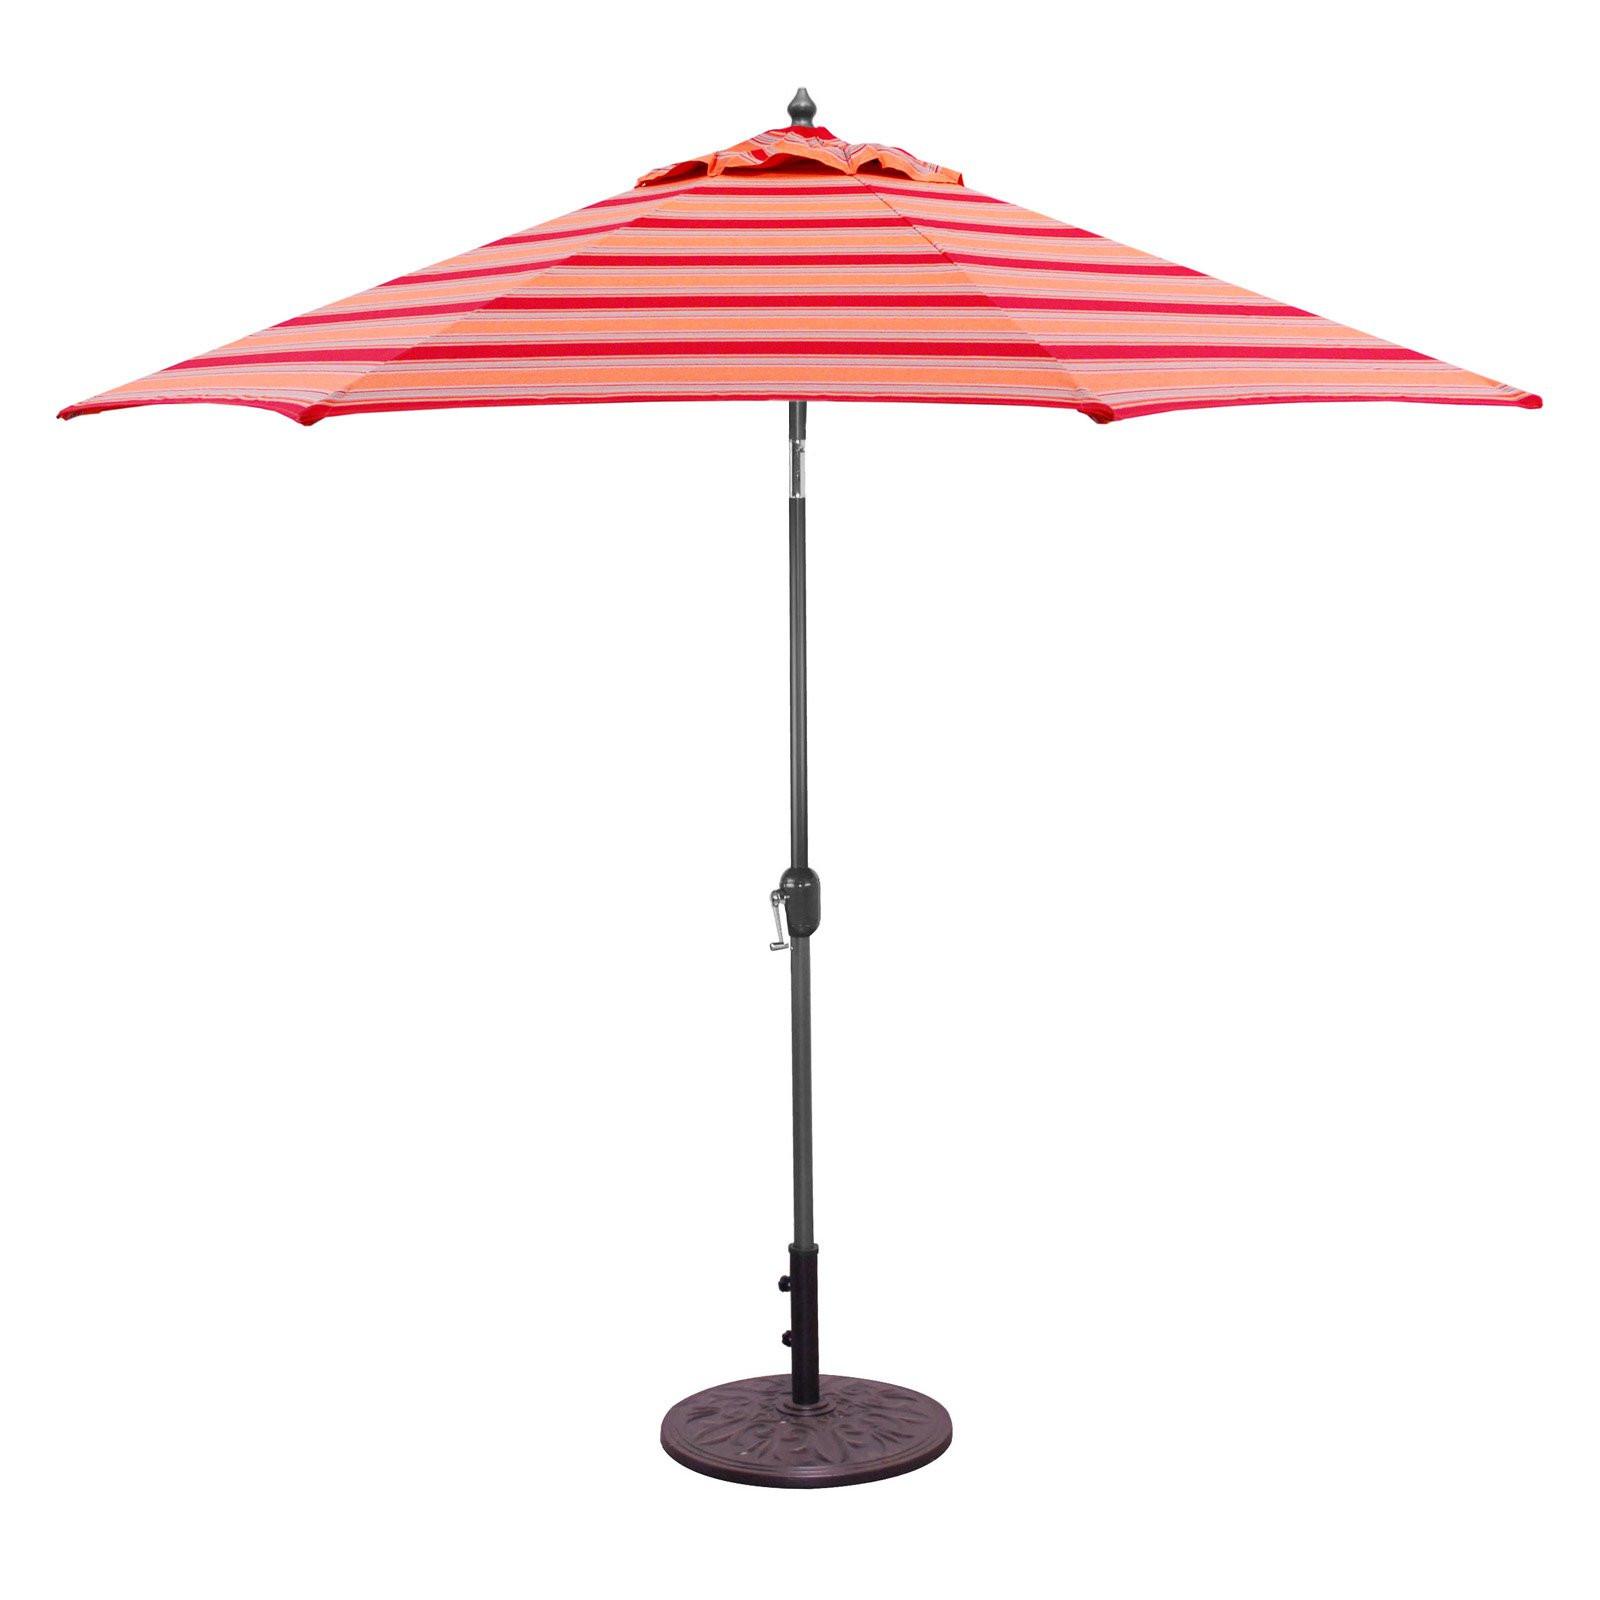 Best ideas about Patio Umbrella Walmart . Save or Pin Galtech 9 ft Sunbrella Aluminum Patio Umbrella Walmart Now.